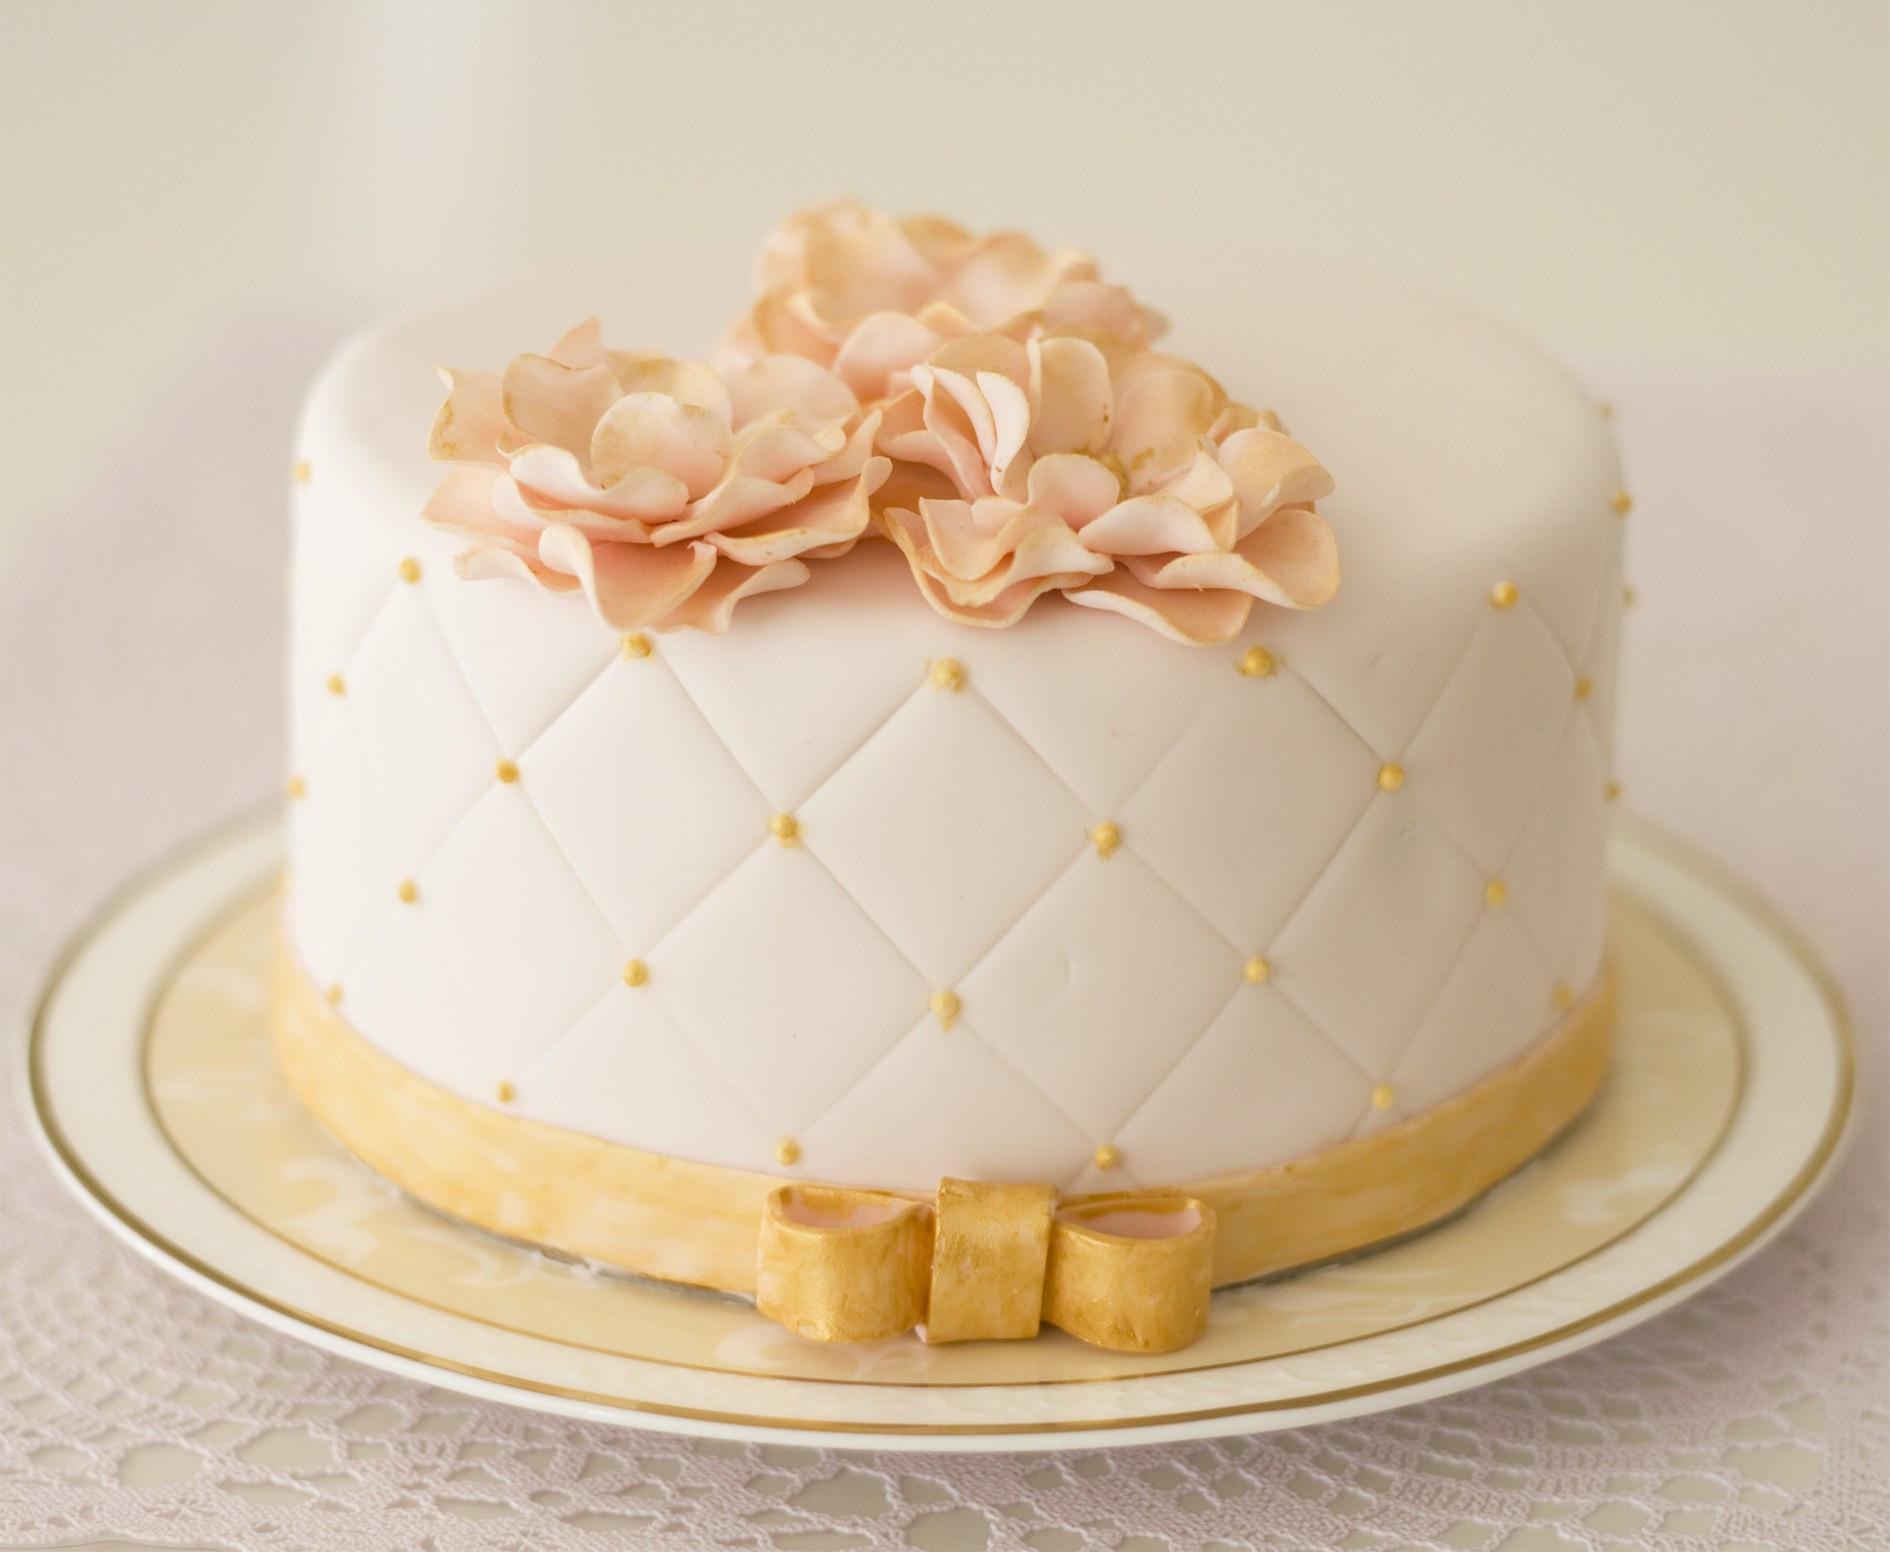 Torte Goldene Hochzeit  deko torte goldene hochzeit rosa gold tc3b6rtchen PqgDXI